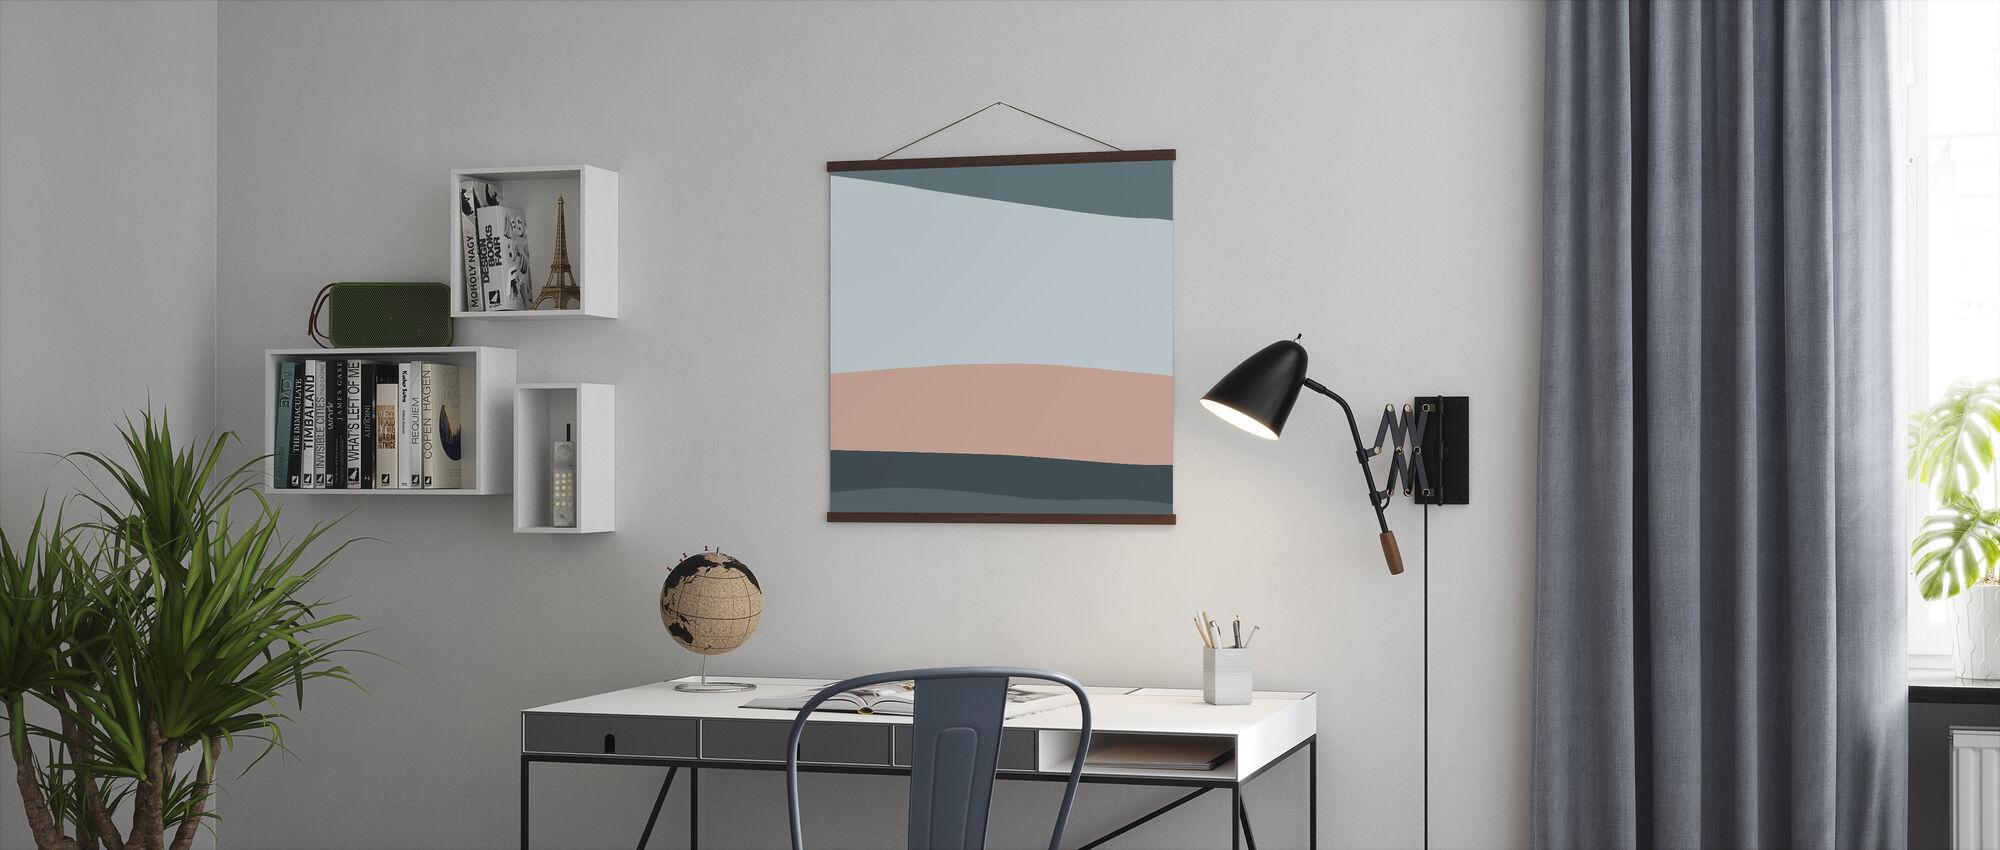 L2 Landscape II - Poster - Office